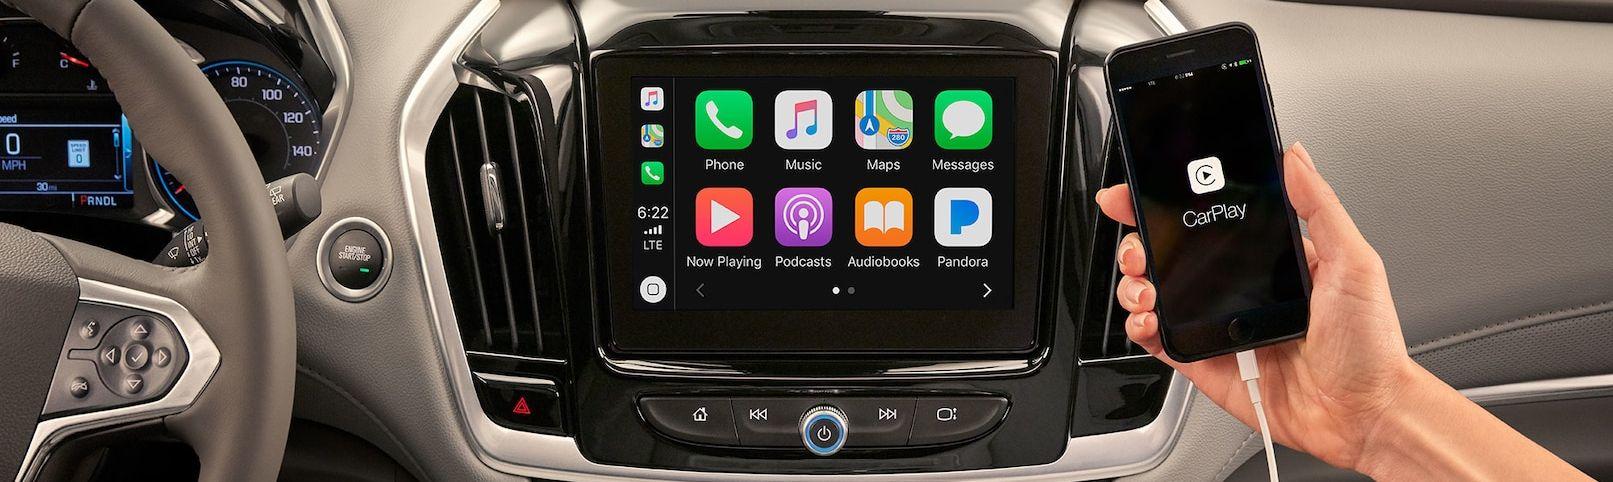 Apple CarPlay in the 2019 Traverse